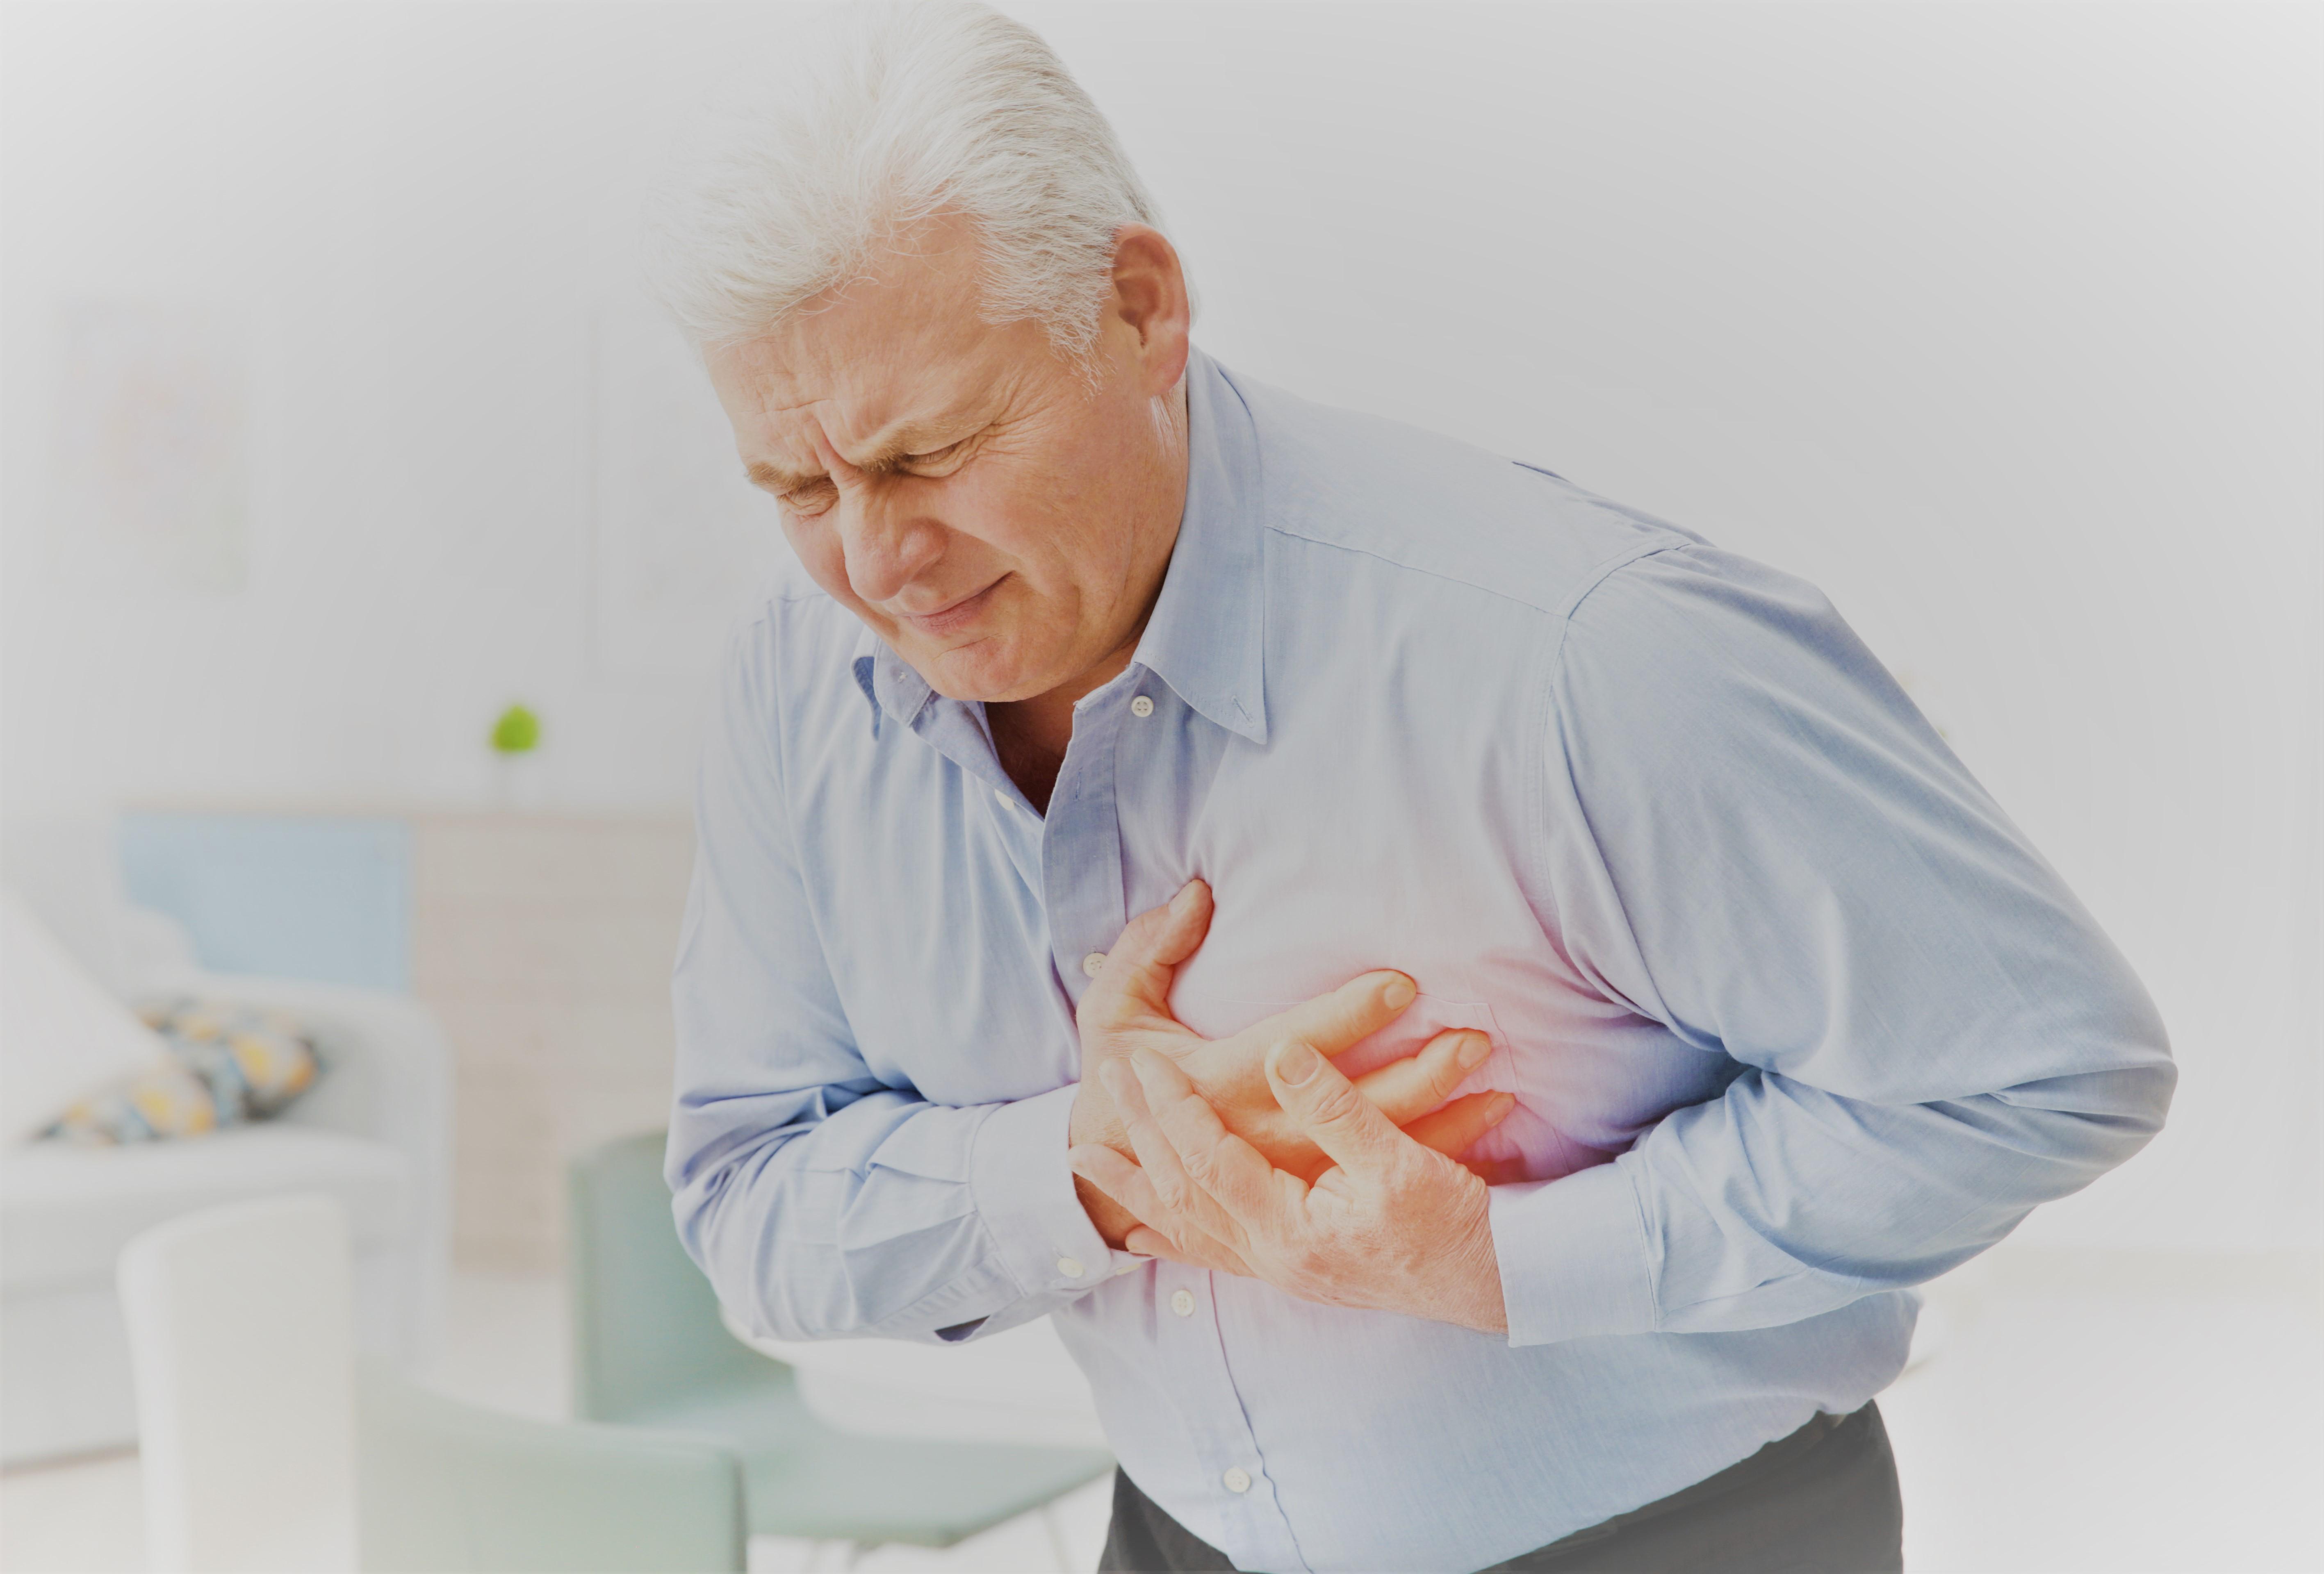 a szív magas vérnyomás miatt fáj)